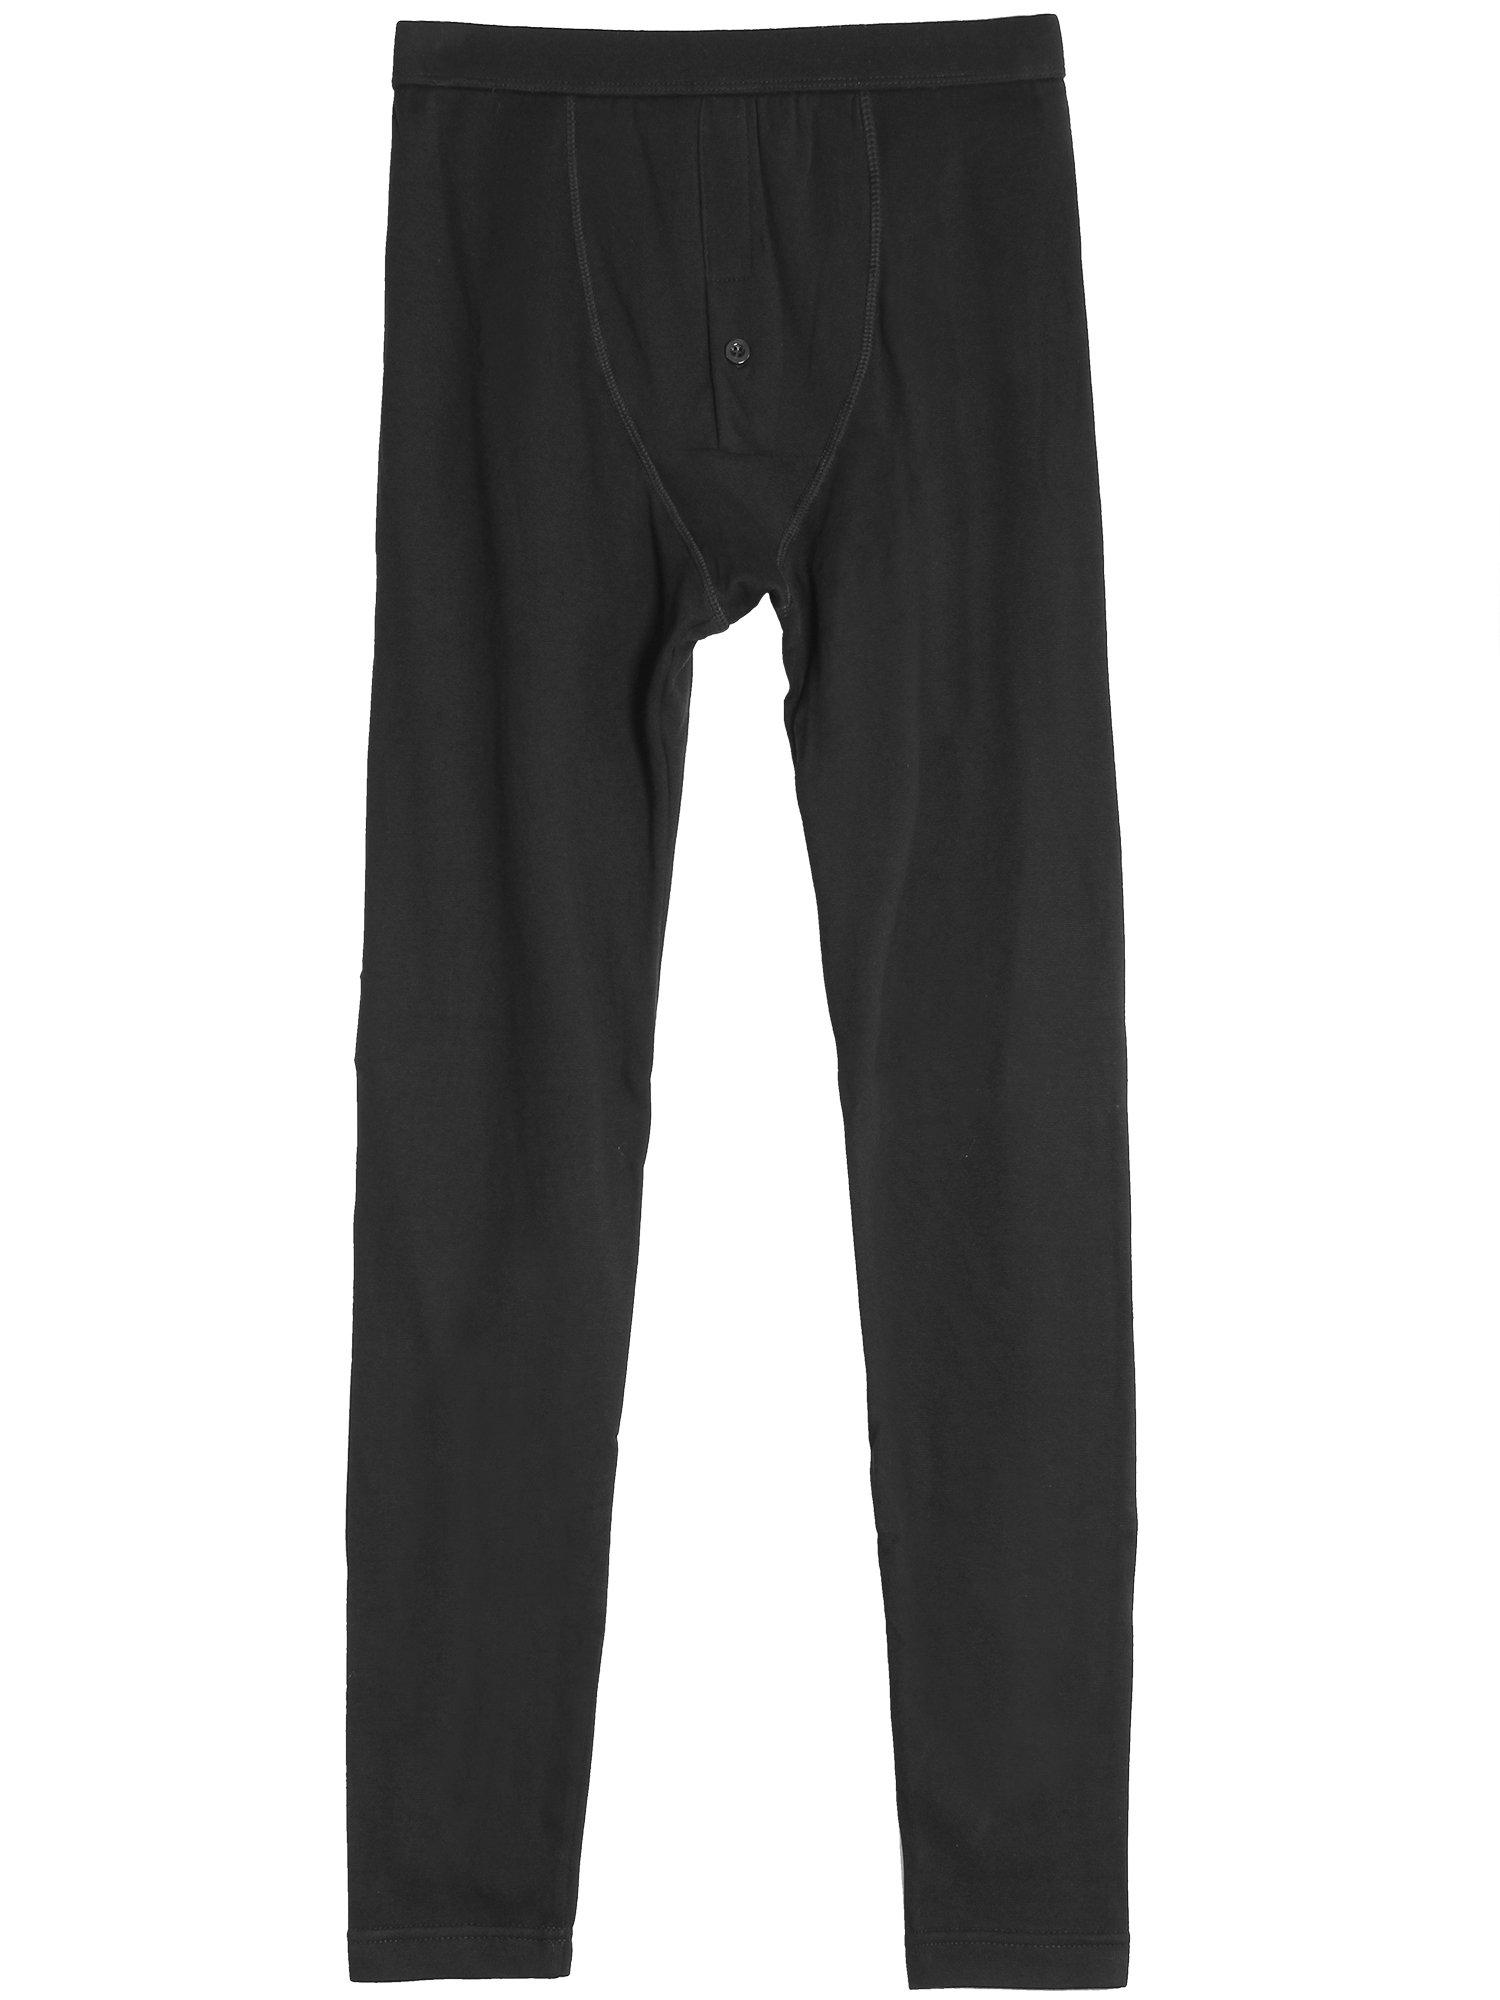 Godsen Men's Classic Thermal Pants Long Johns Bottom/Legging (L, GW01-Black)